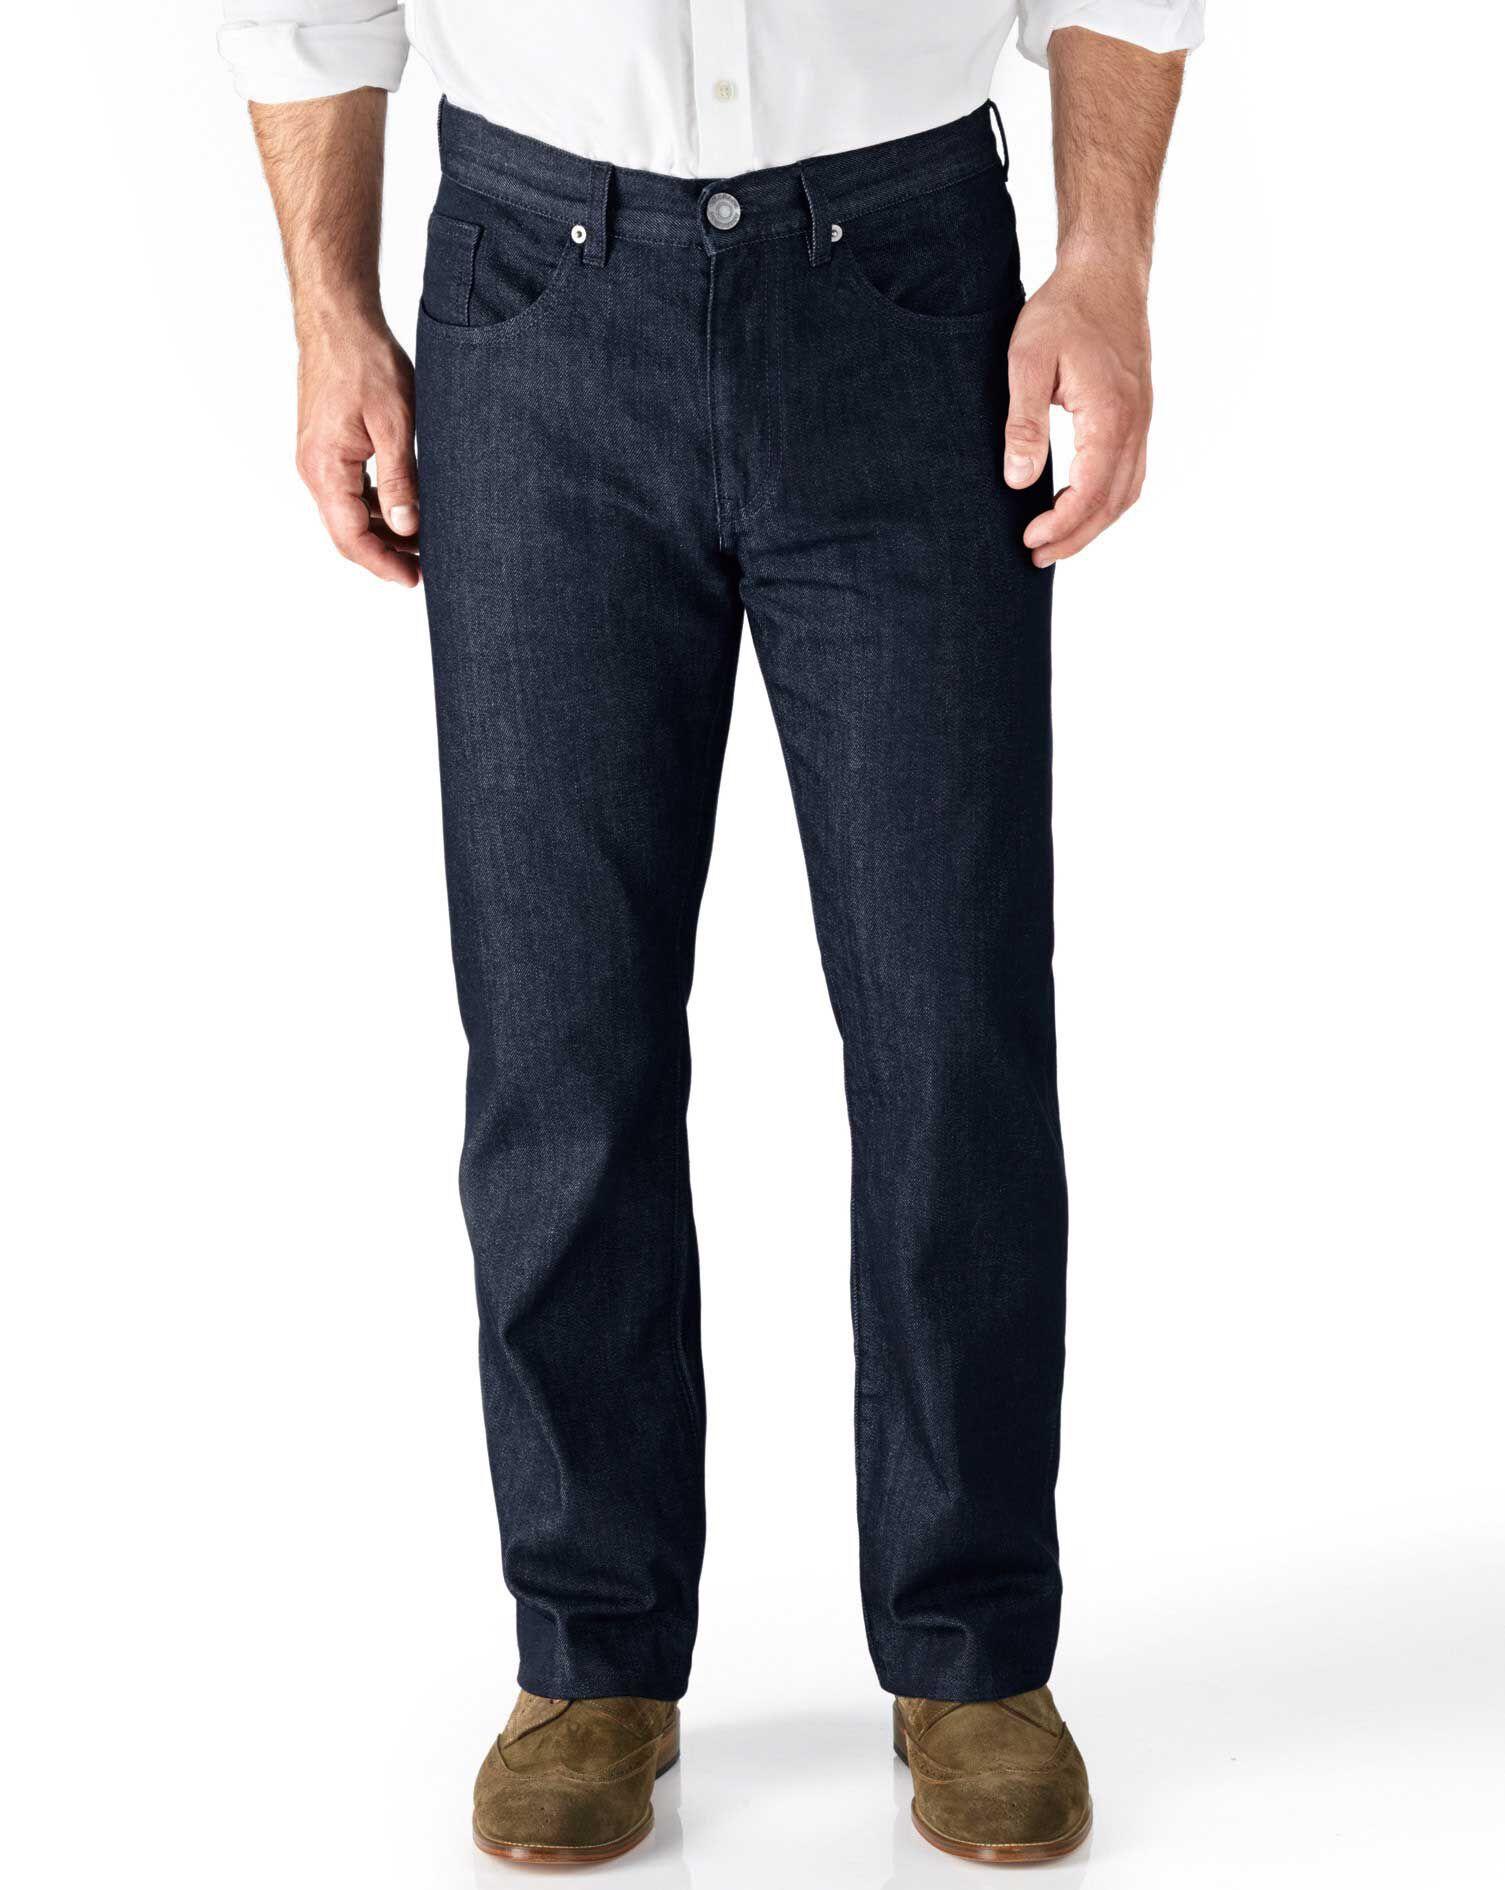 Dark Blue Classic Fit 5 Pocket Denim Jeans Size W40 L34 by Charles Tyrwhitt